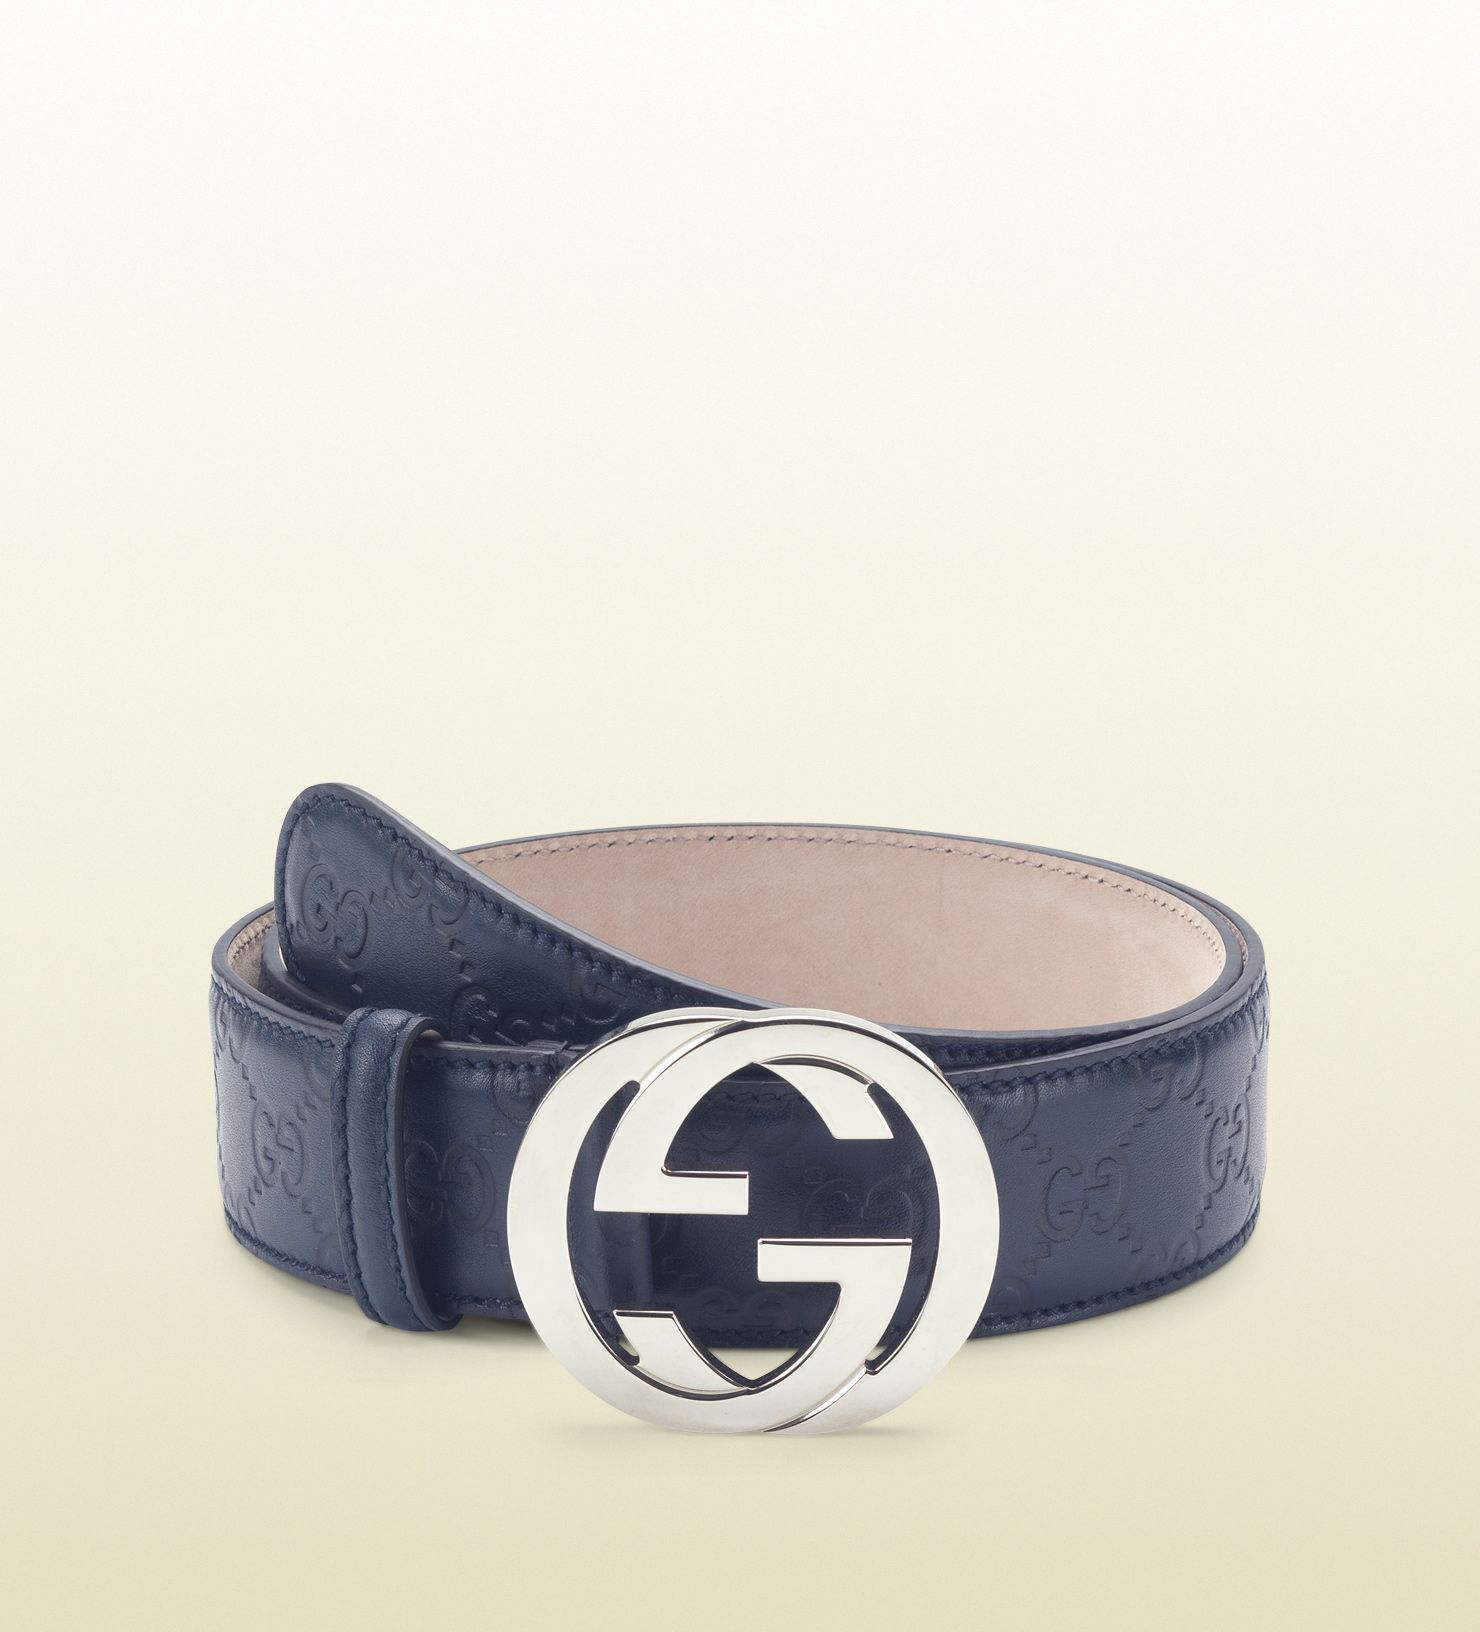 4fbb10dcc blue guccissima leather belt with interlocking G bu ...   GUCCI ...